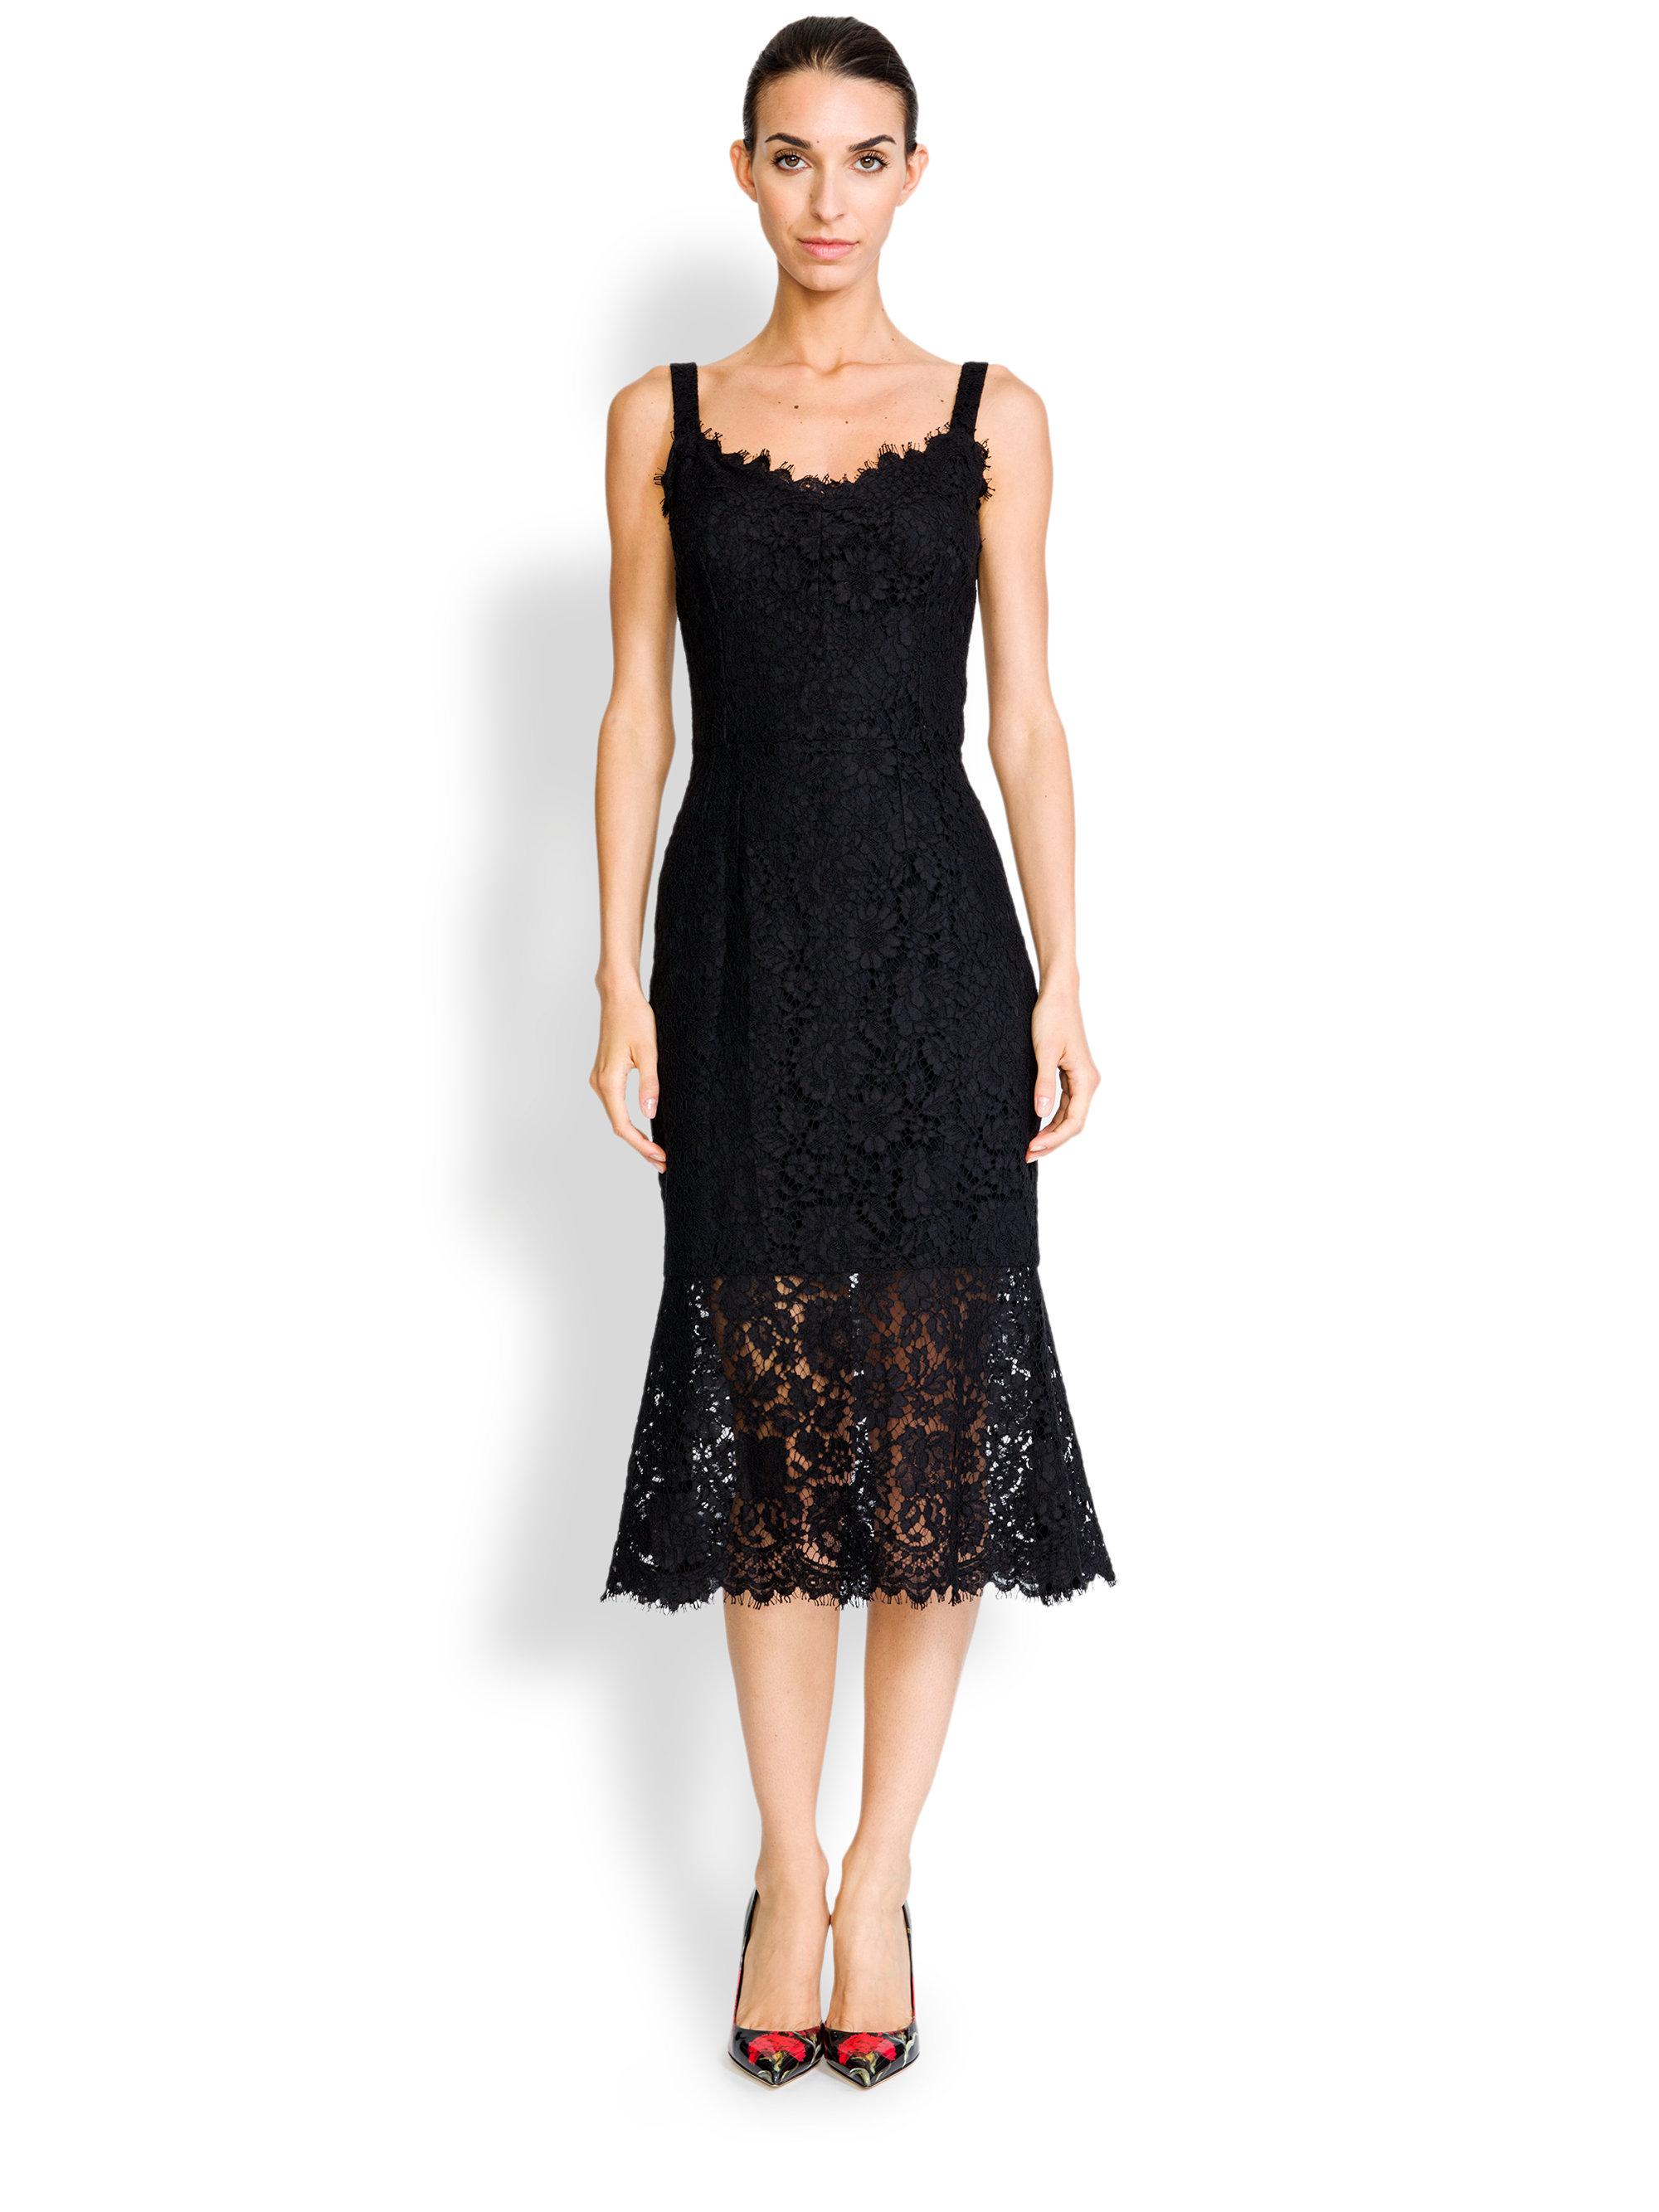 49926fbbb Dolce And Gabbana Black Dress. Dolce   gabbana Lace Corset Dress in Black